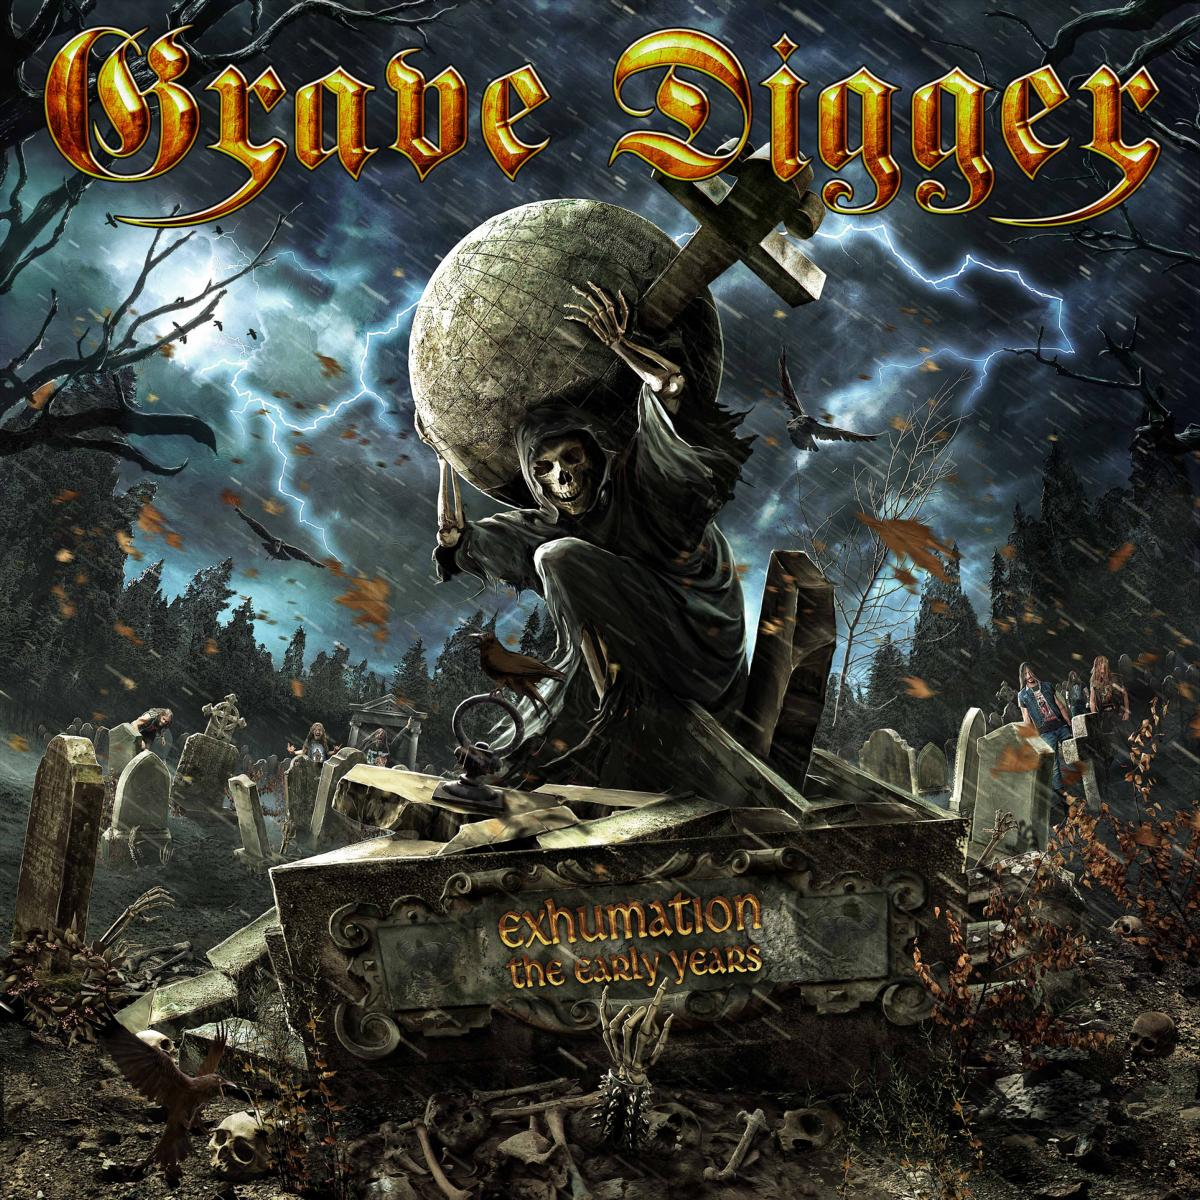 gravediggerexhumationcover